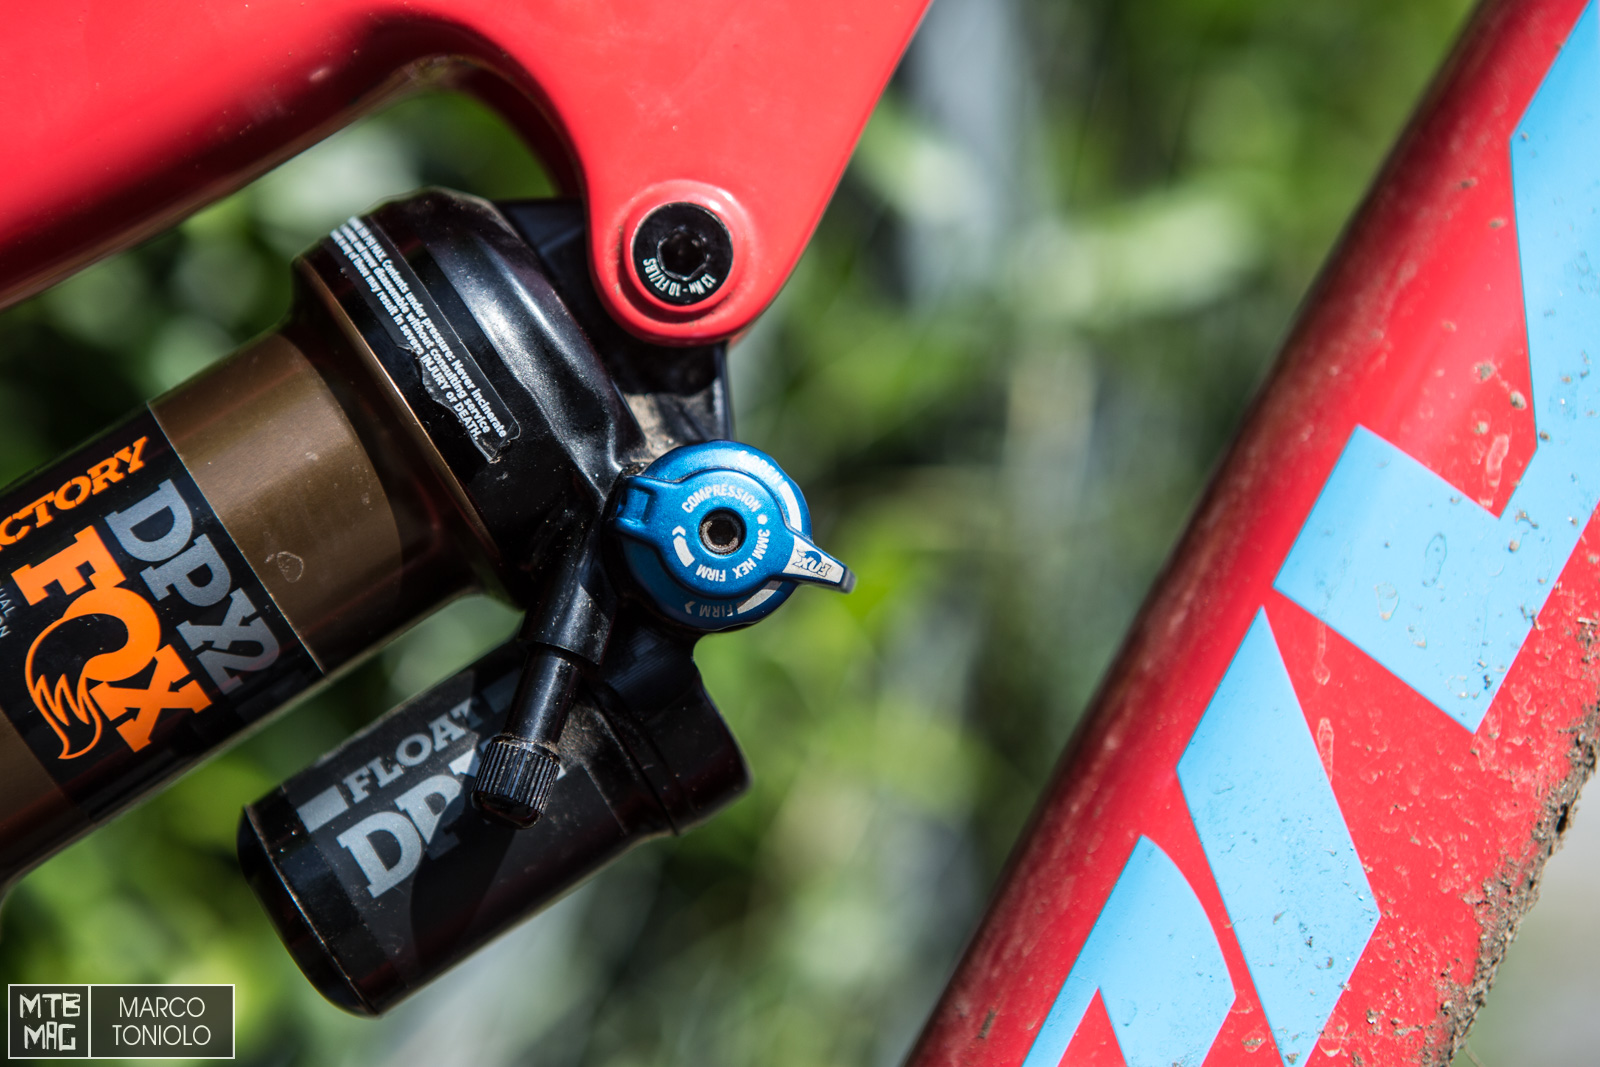 MTB-MAG COM - Mountain Bike Magazine | [Tested] Fox DPX2 Shock